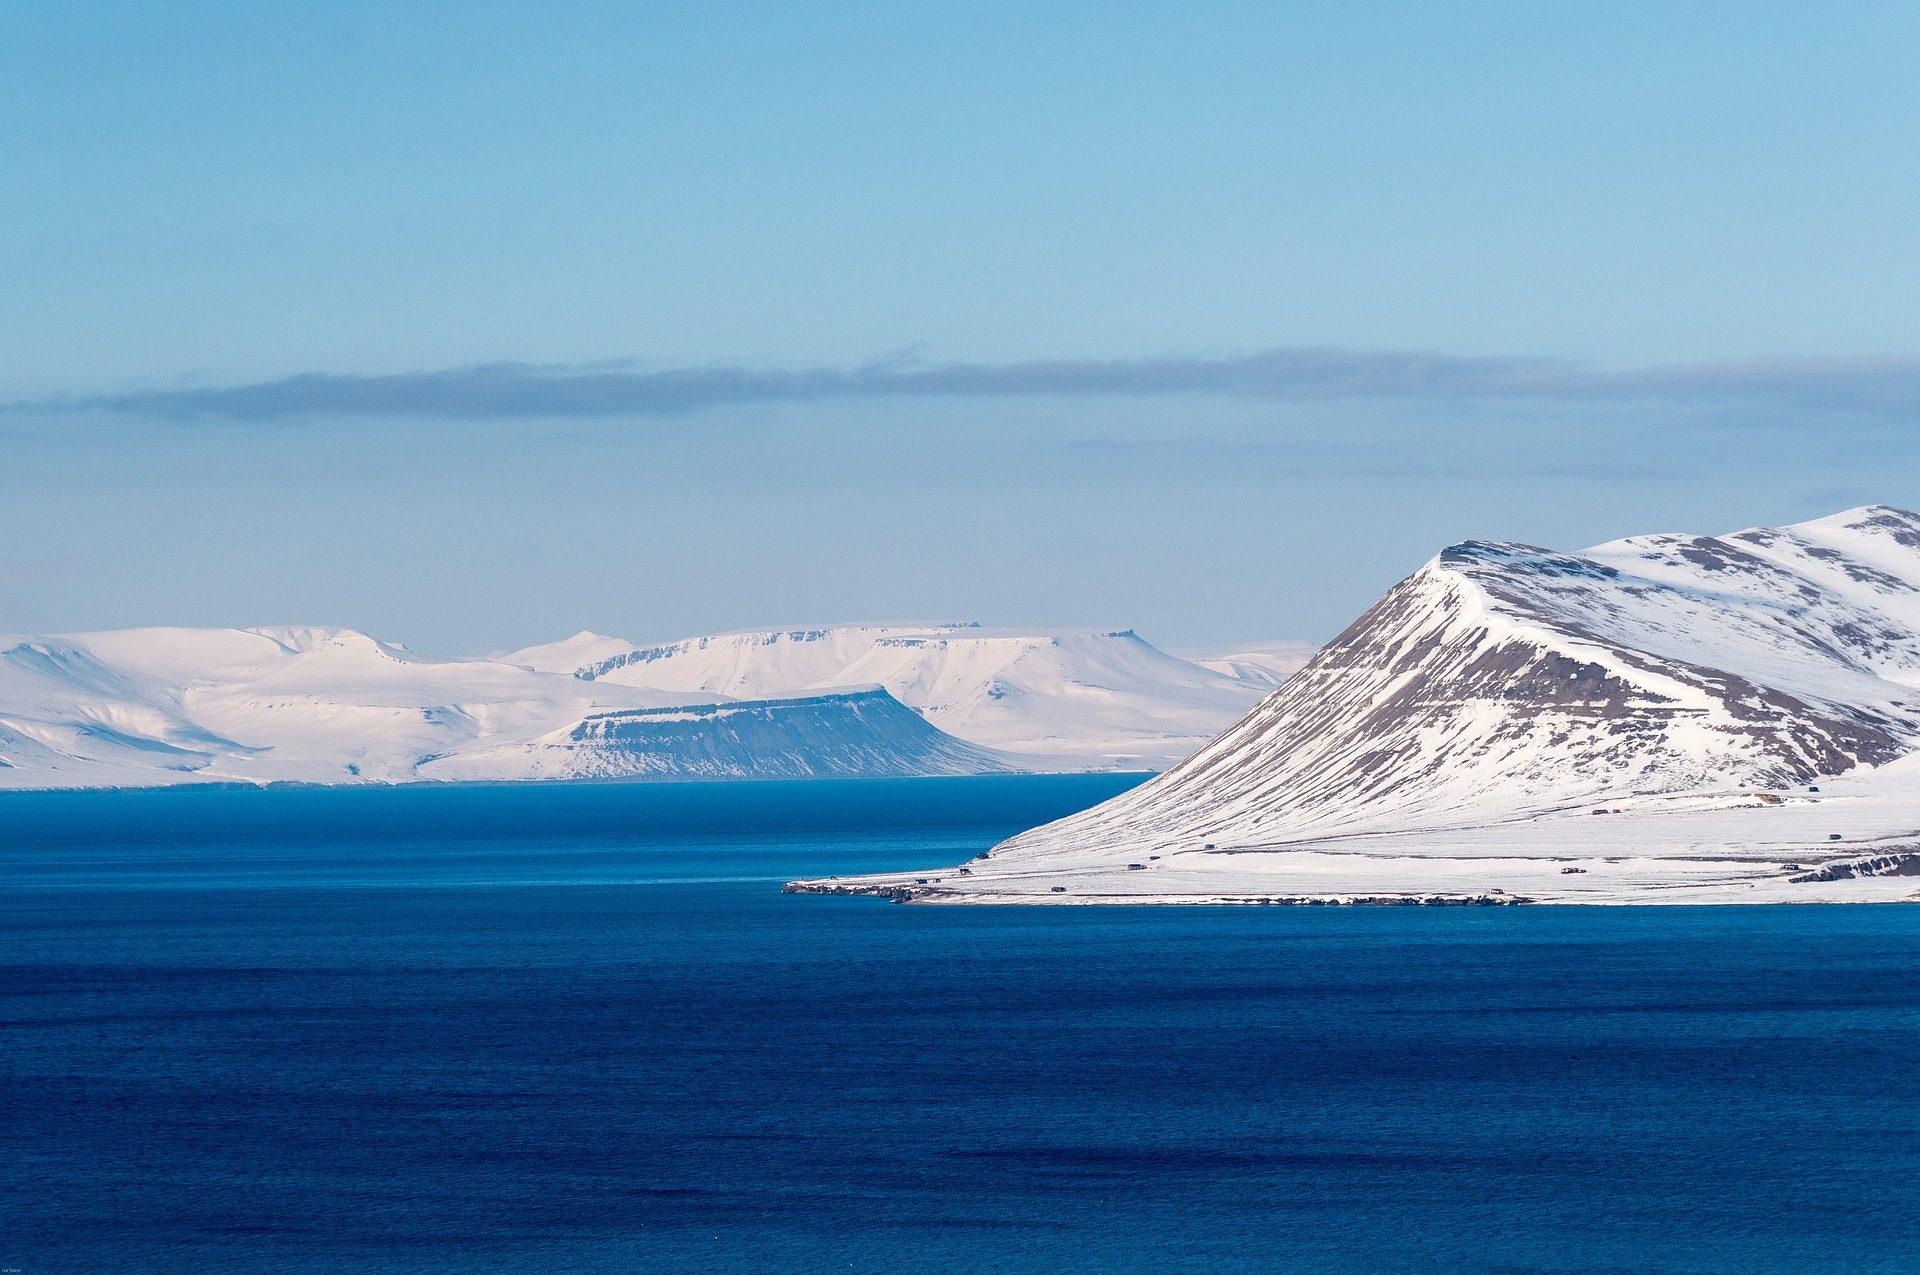 Montañas, 雪, 地平线, 距离, 斯瓦尔巴特, 挪威 - 高清壁纸 - 教授-falken.com